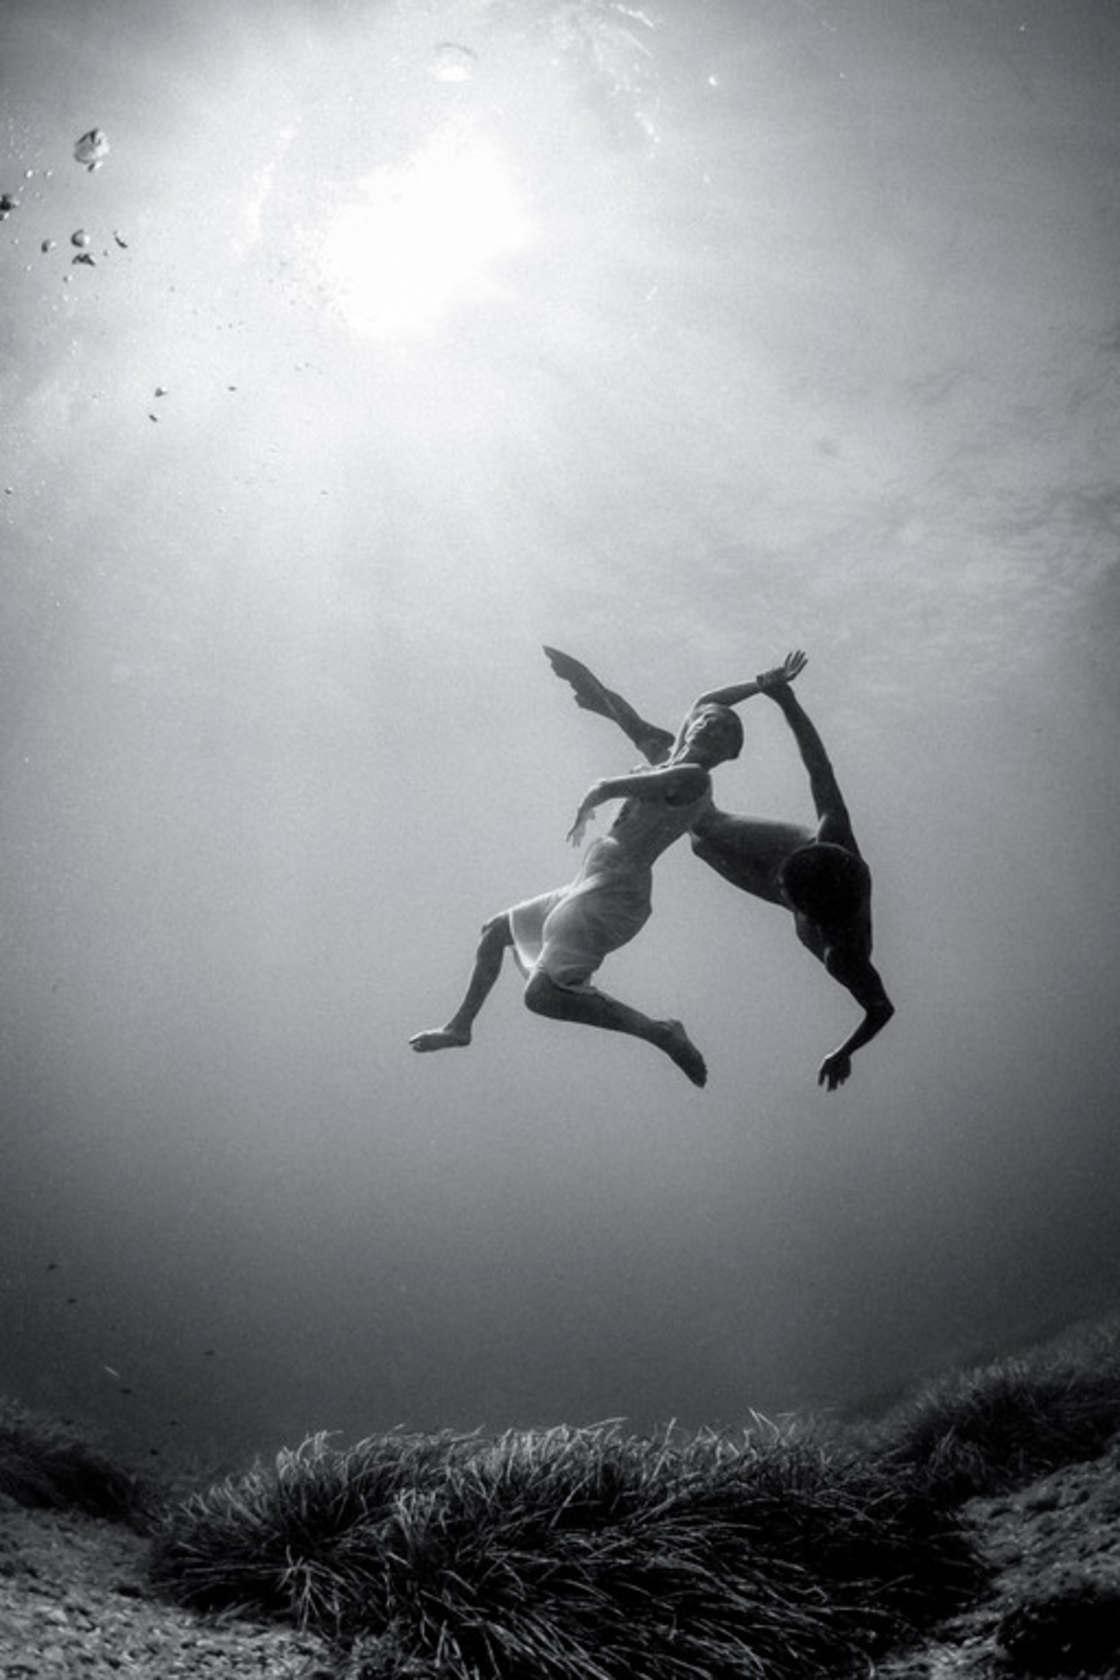 Liquid Dreams - Capturing ballerinas underwater in captivating photos